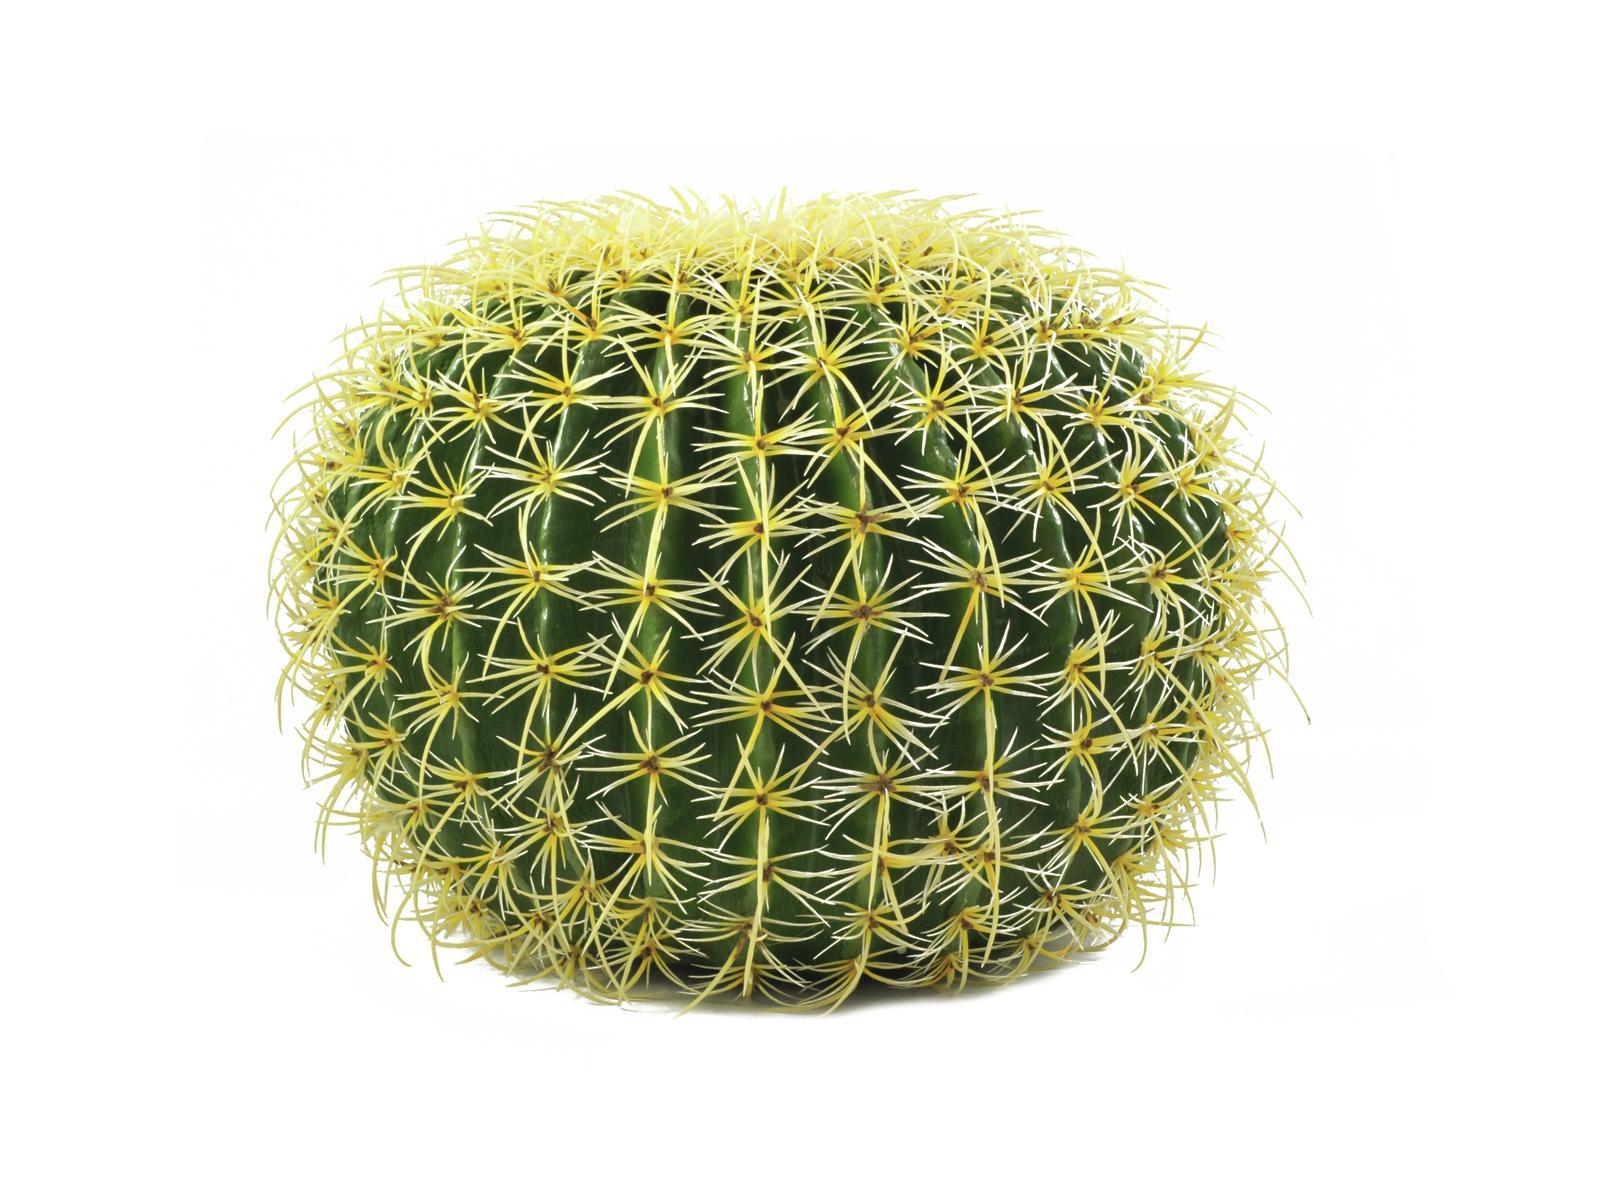 Kulatý zlatý kaktus, 37cm